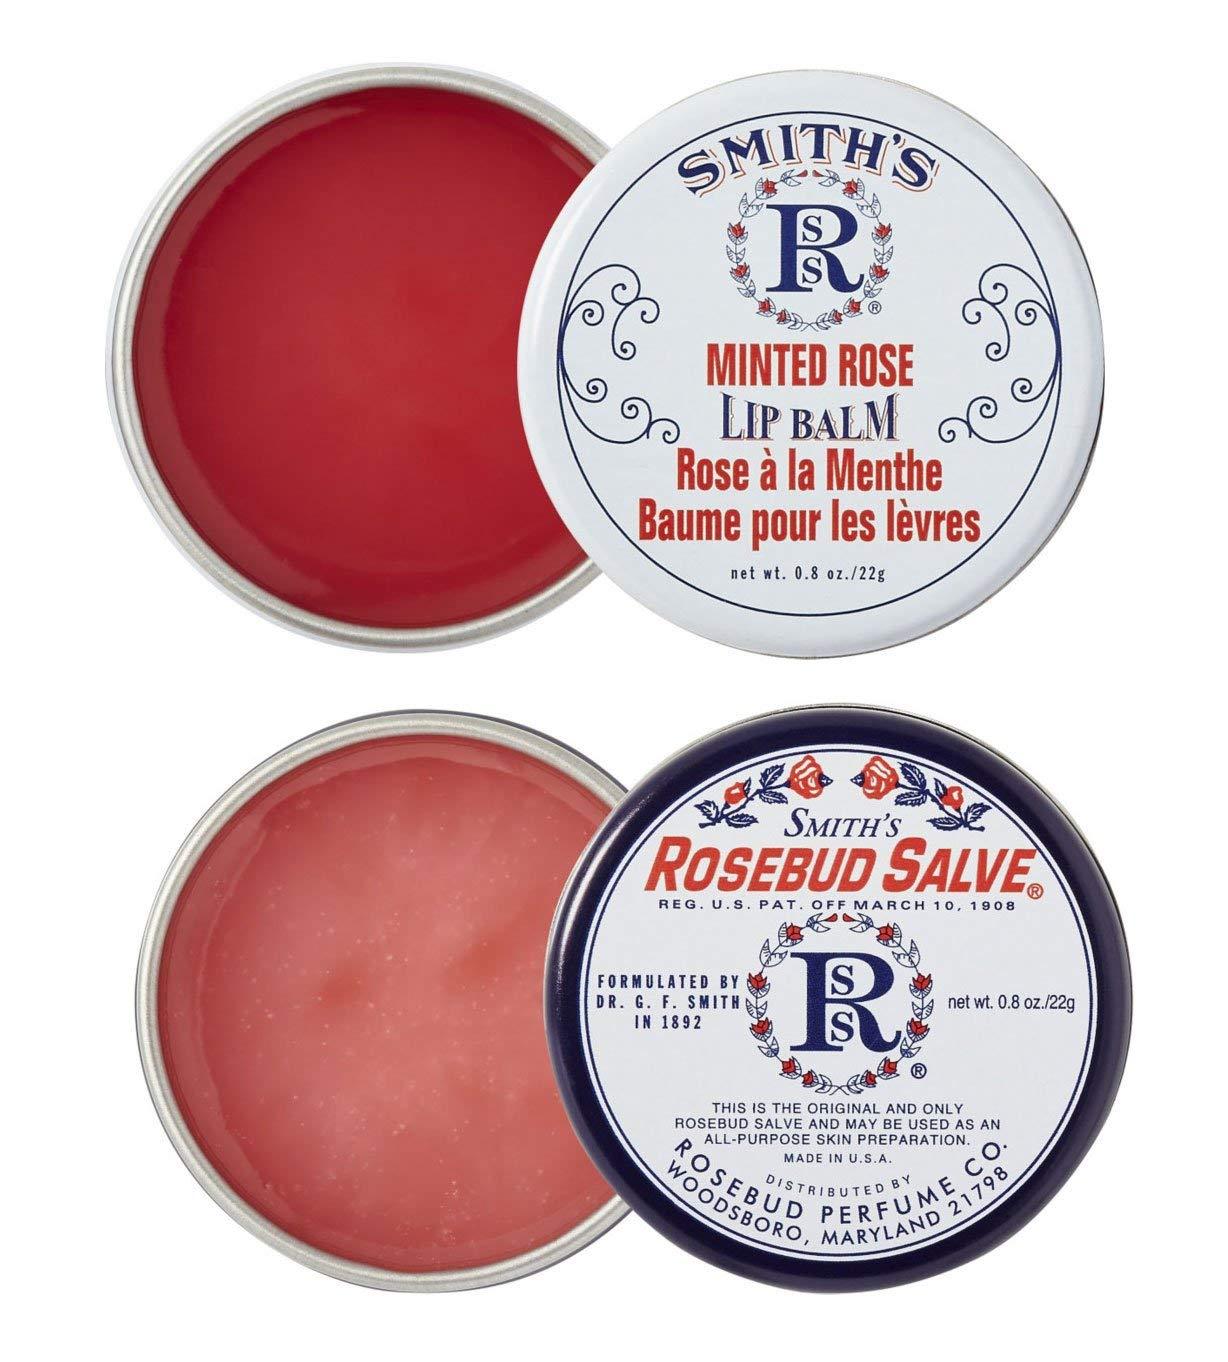 Rosebud Perfume Co. ROSEBUD SALVE / MINTED ROSE Lip Balm Two Pack: 2 x 0.8 tins